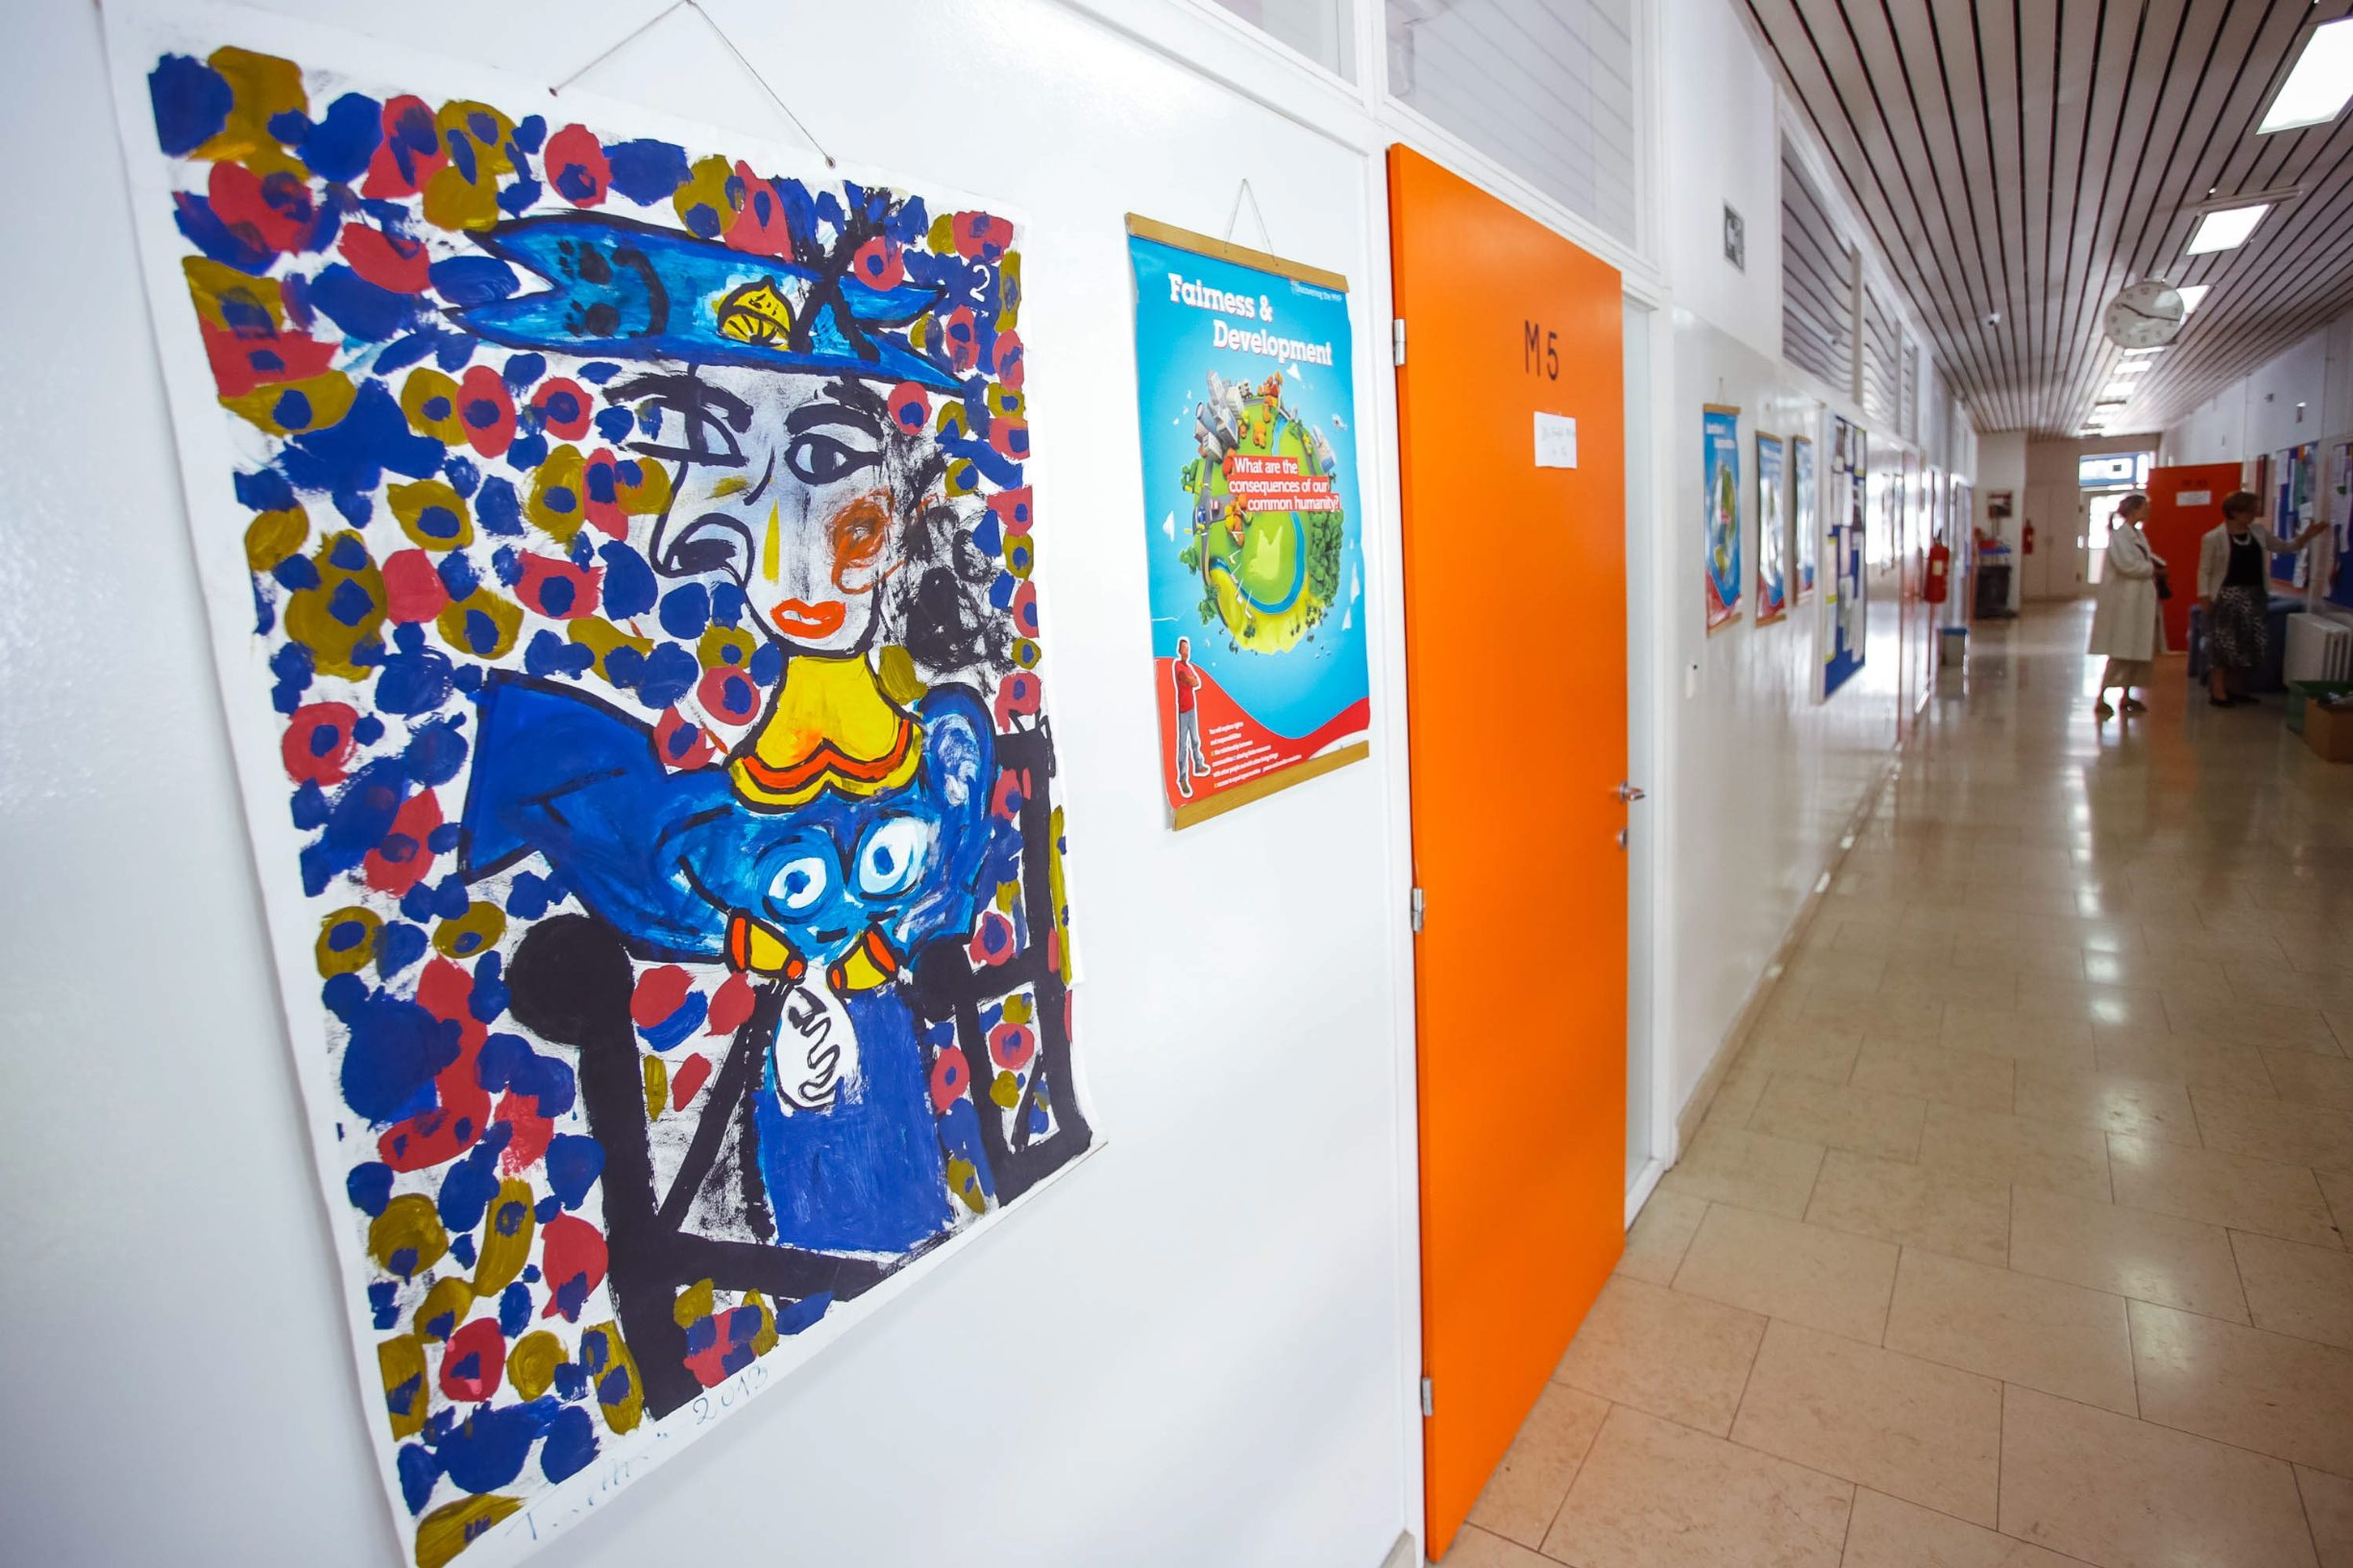 Zagreb, 240519. Jordanovac. XV. gimnazija, popularno zvana MIOC, je prirodoslovna matematicka gimnazija. Ma fotografiji: skola. Foto: Marko Todorov / CROPIX